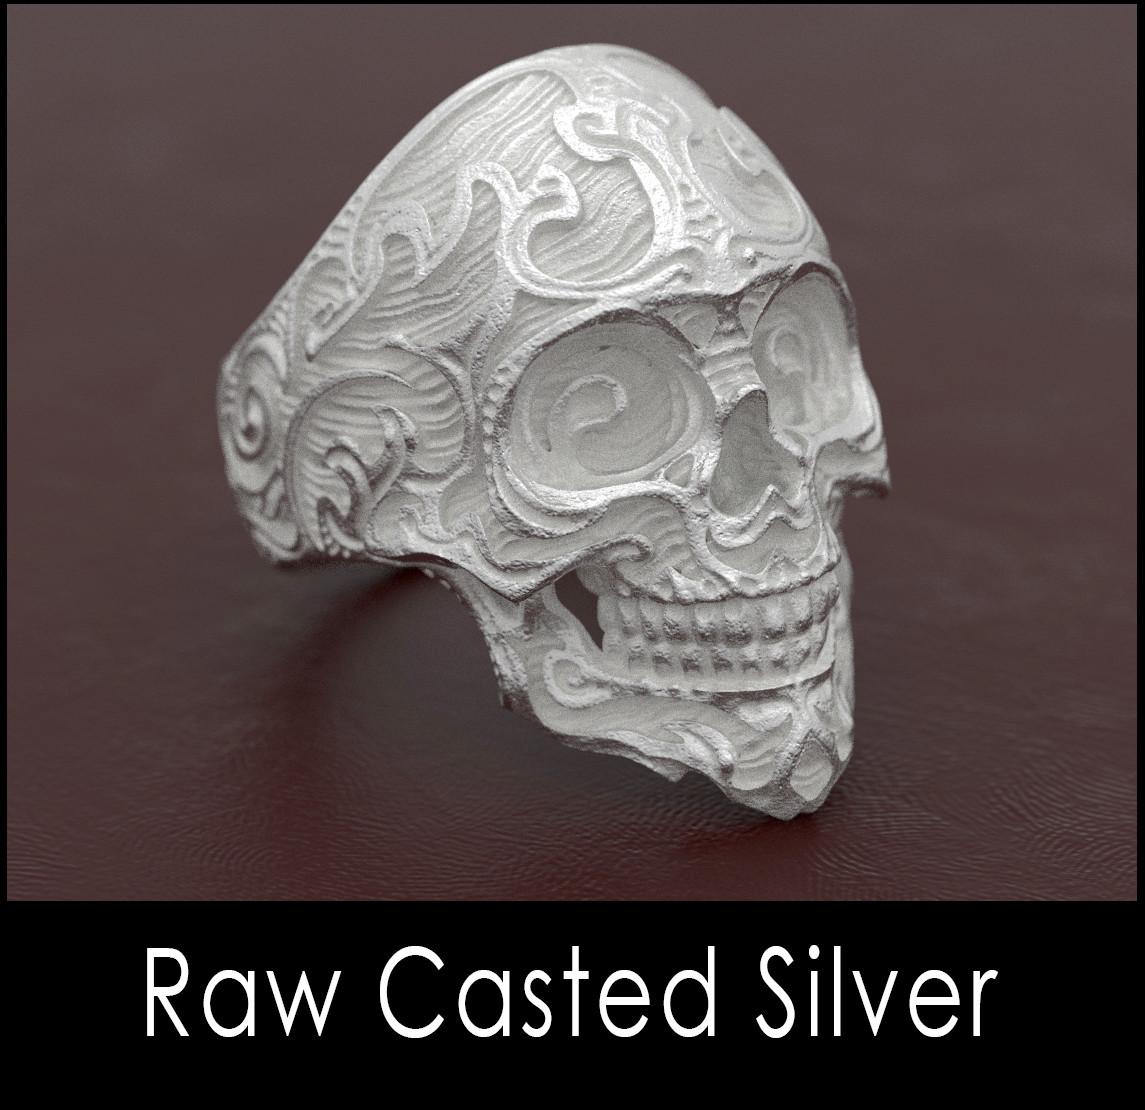 Nacho riesco gostanza raw casted silver